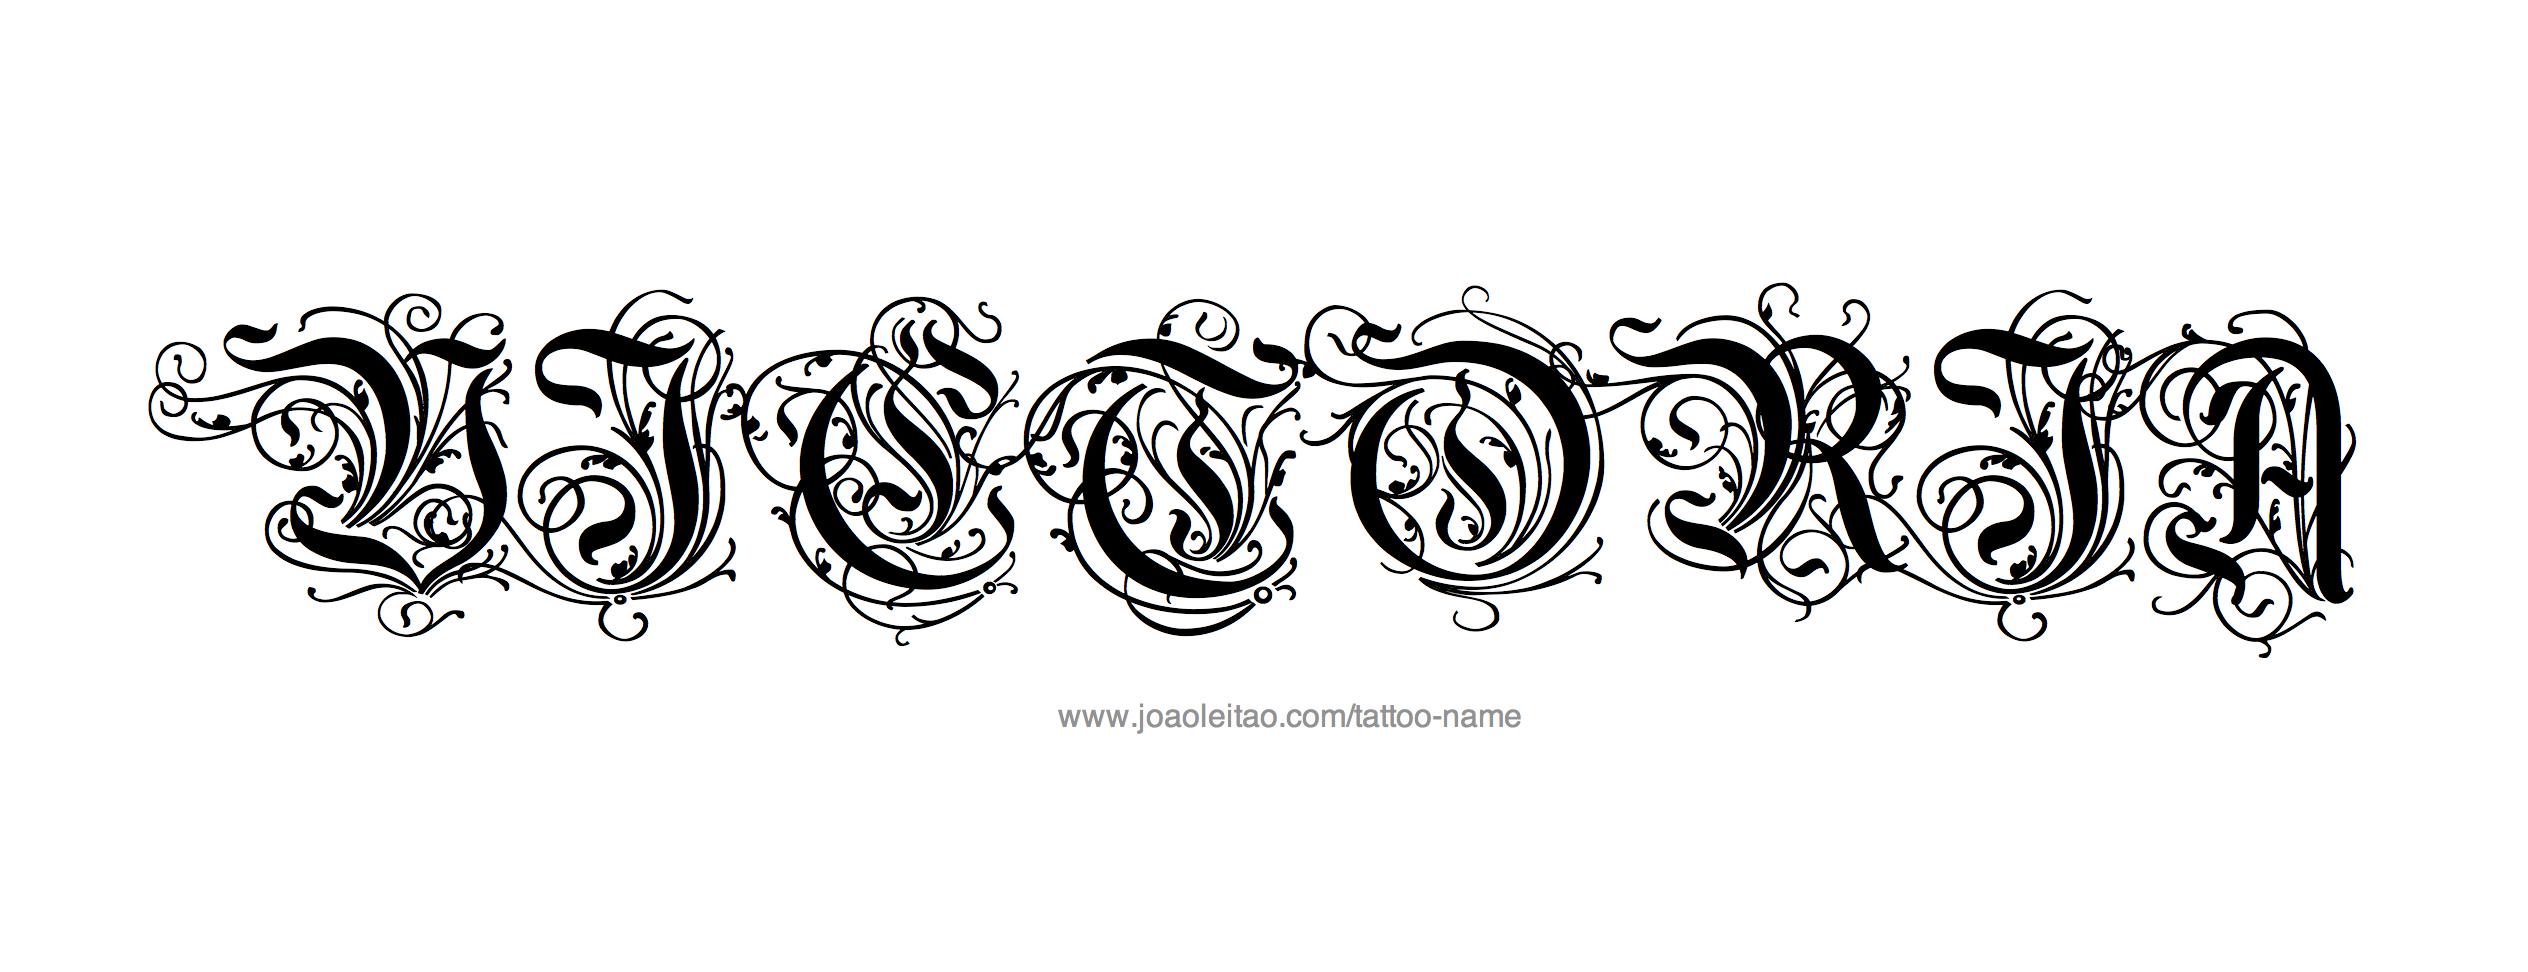 Tattoo Design Name Victoria